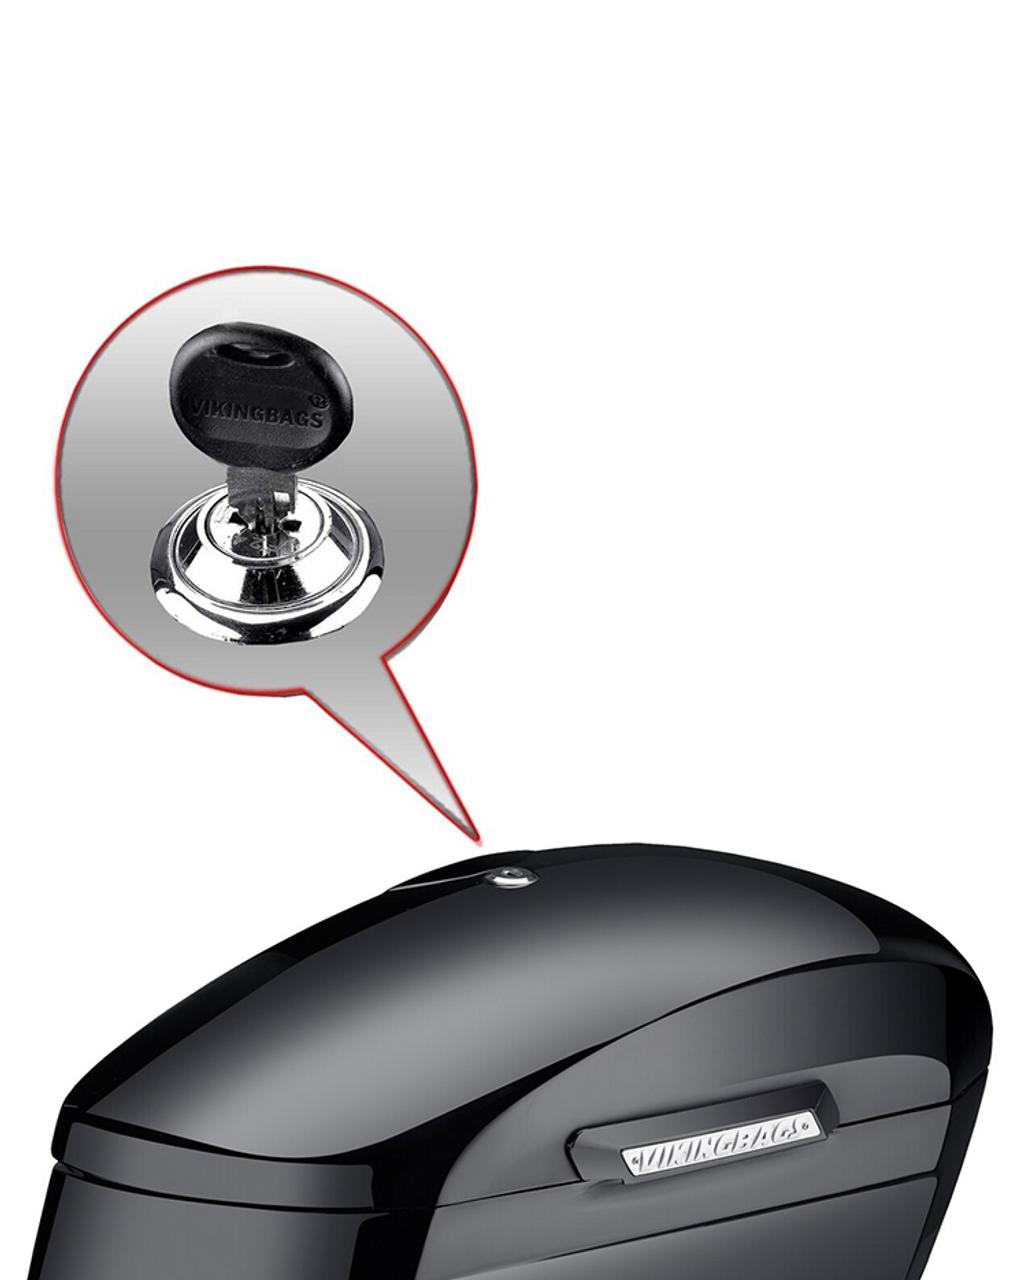 Honda 1500 Valkyrie Standard Lamellar Extra Large Shock Cutout Saddlebag Key Lock View